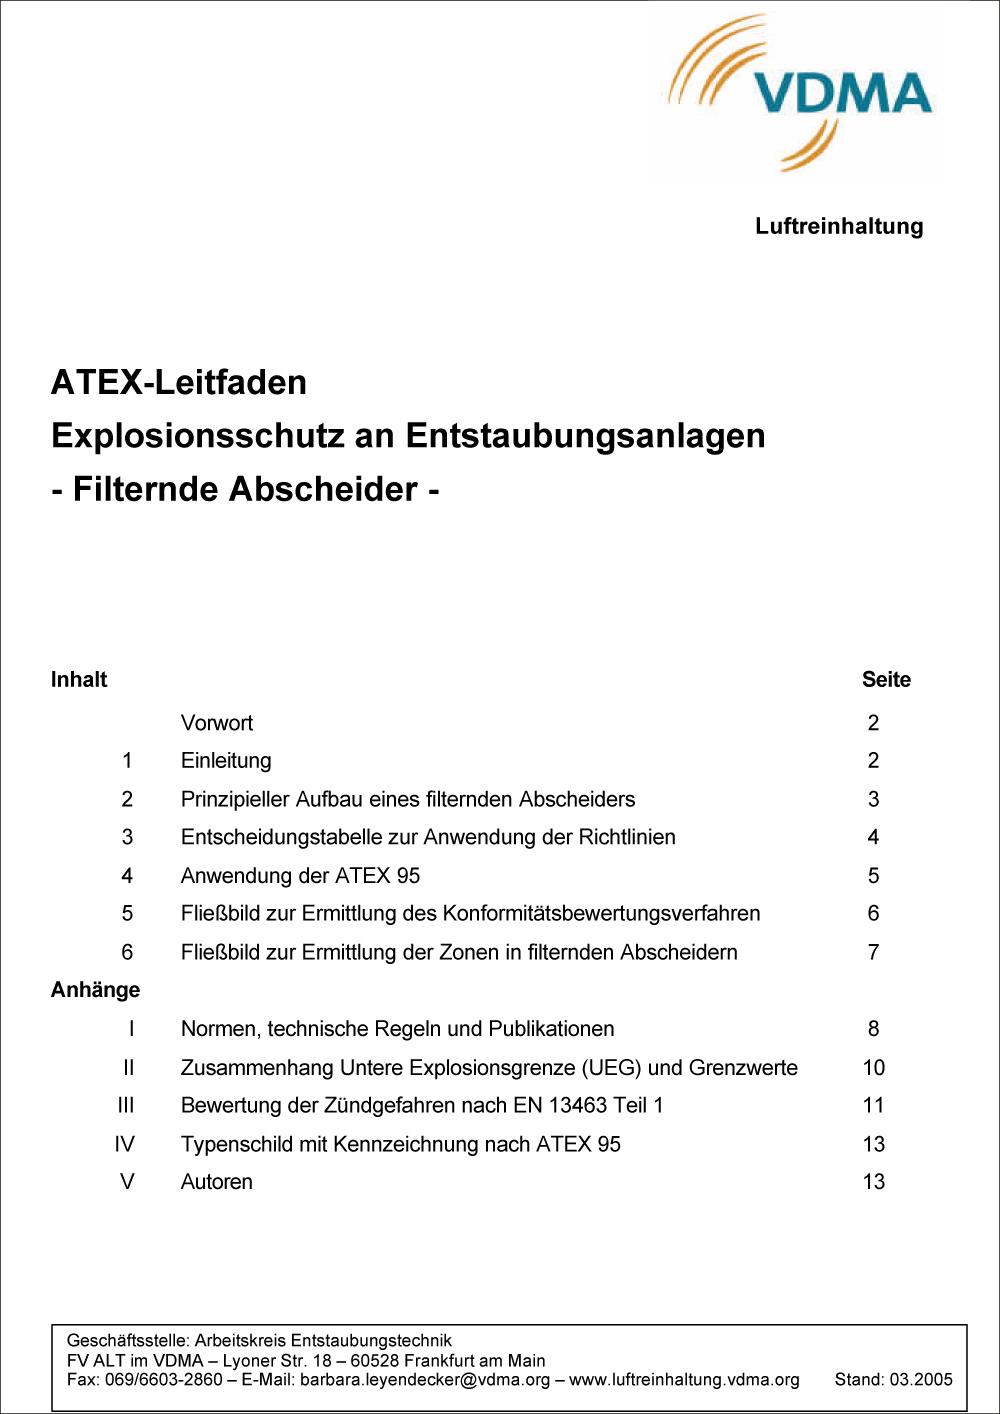 VDMA: ATEX Leitfaden - Explosionsschutz an Entstaubungsanlagen